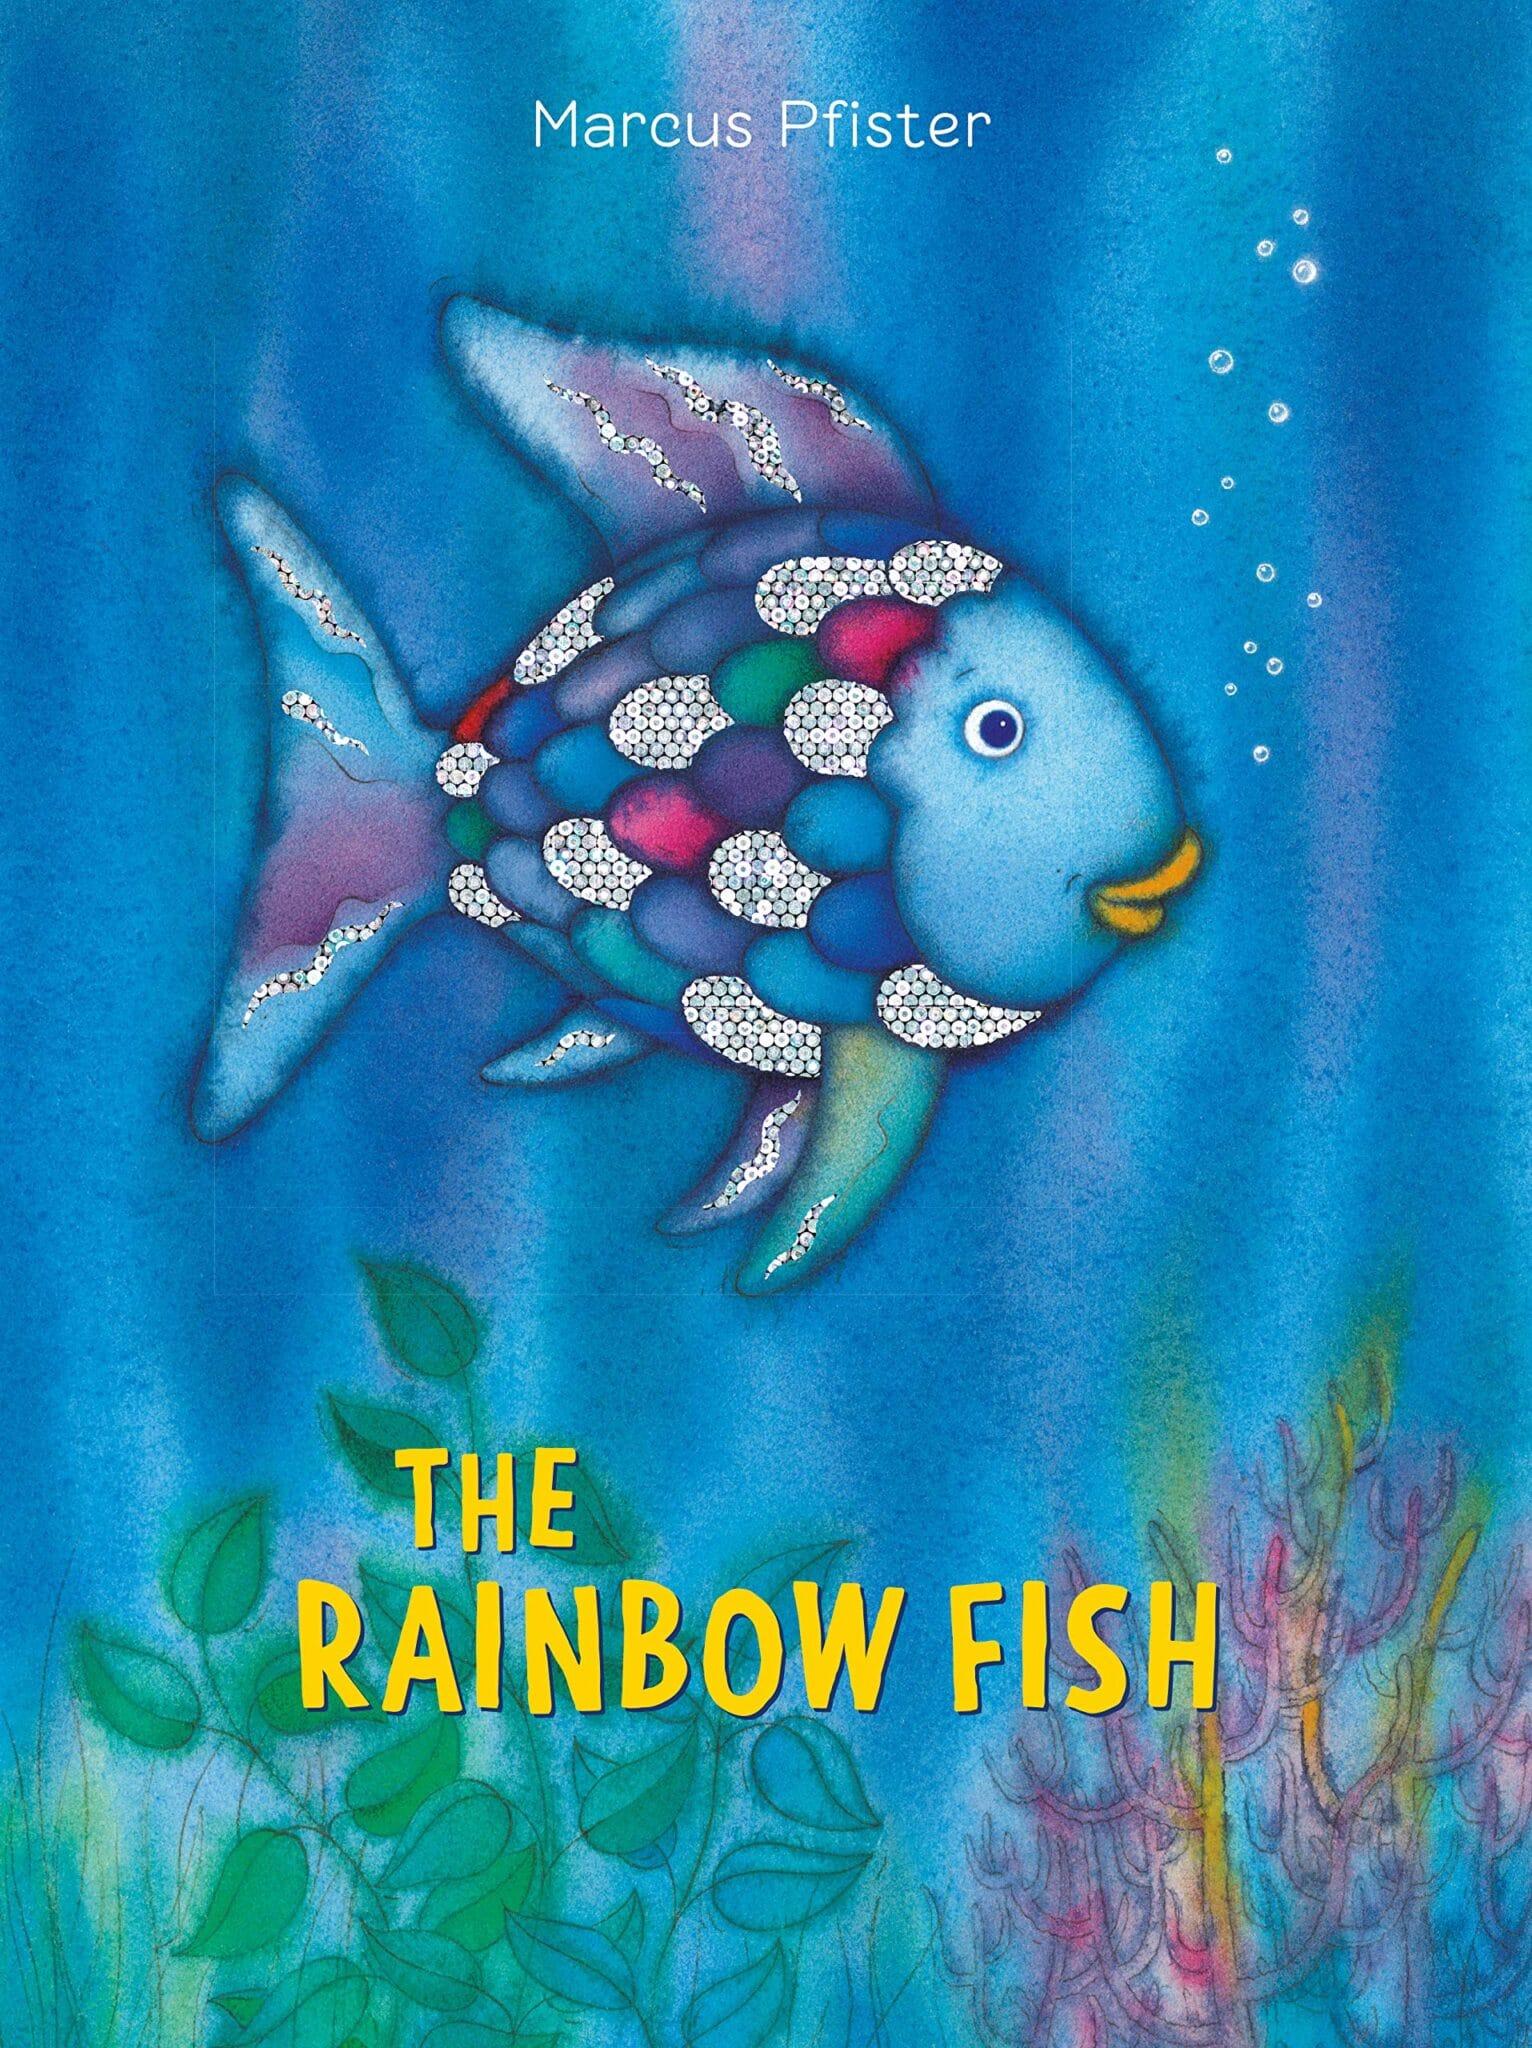 The Rainbow fish book